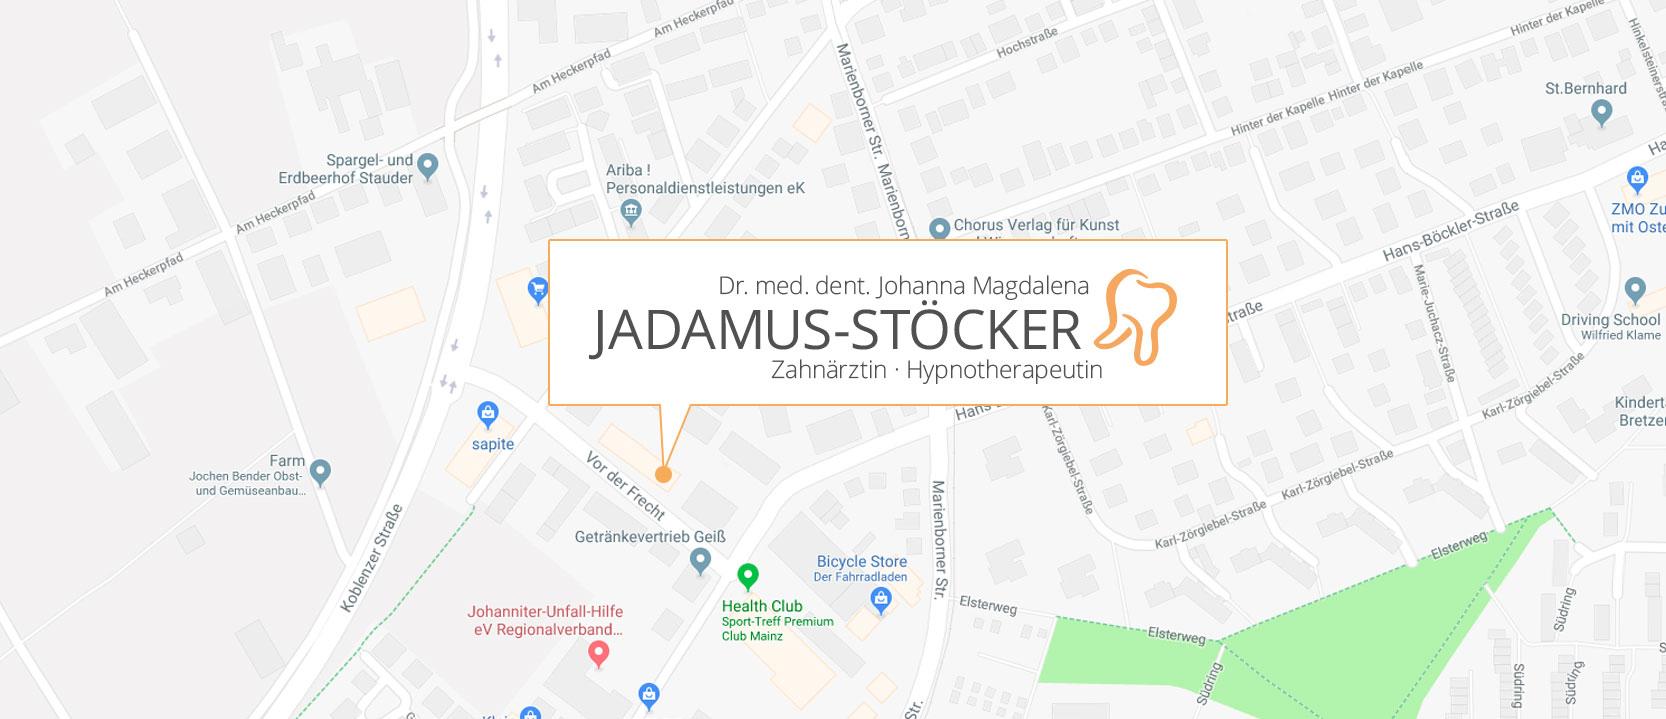 Zahnarztpraxis Jadamus-Stöcker Anfahrt